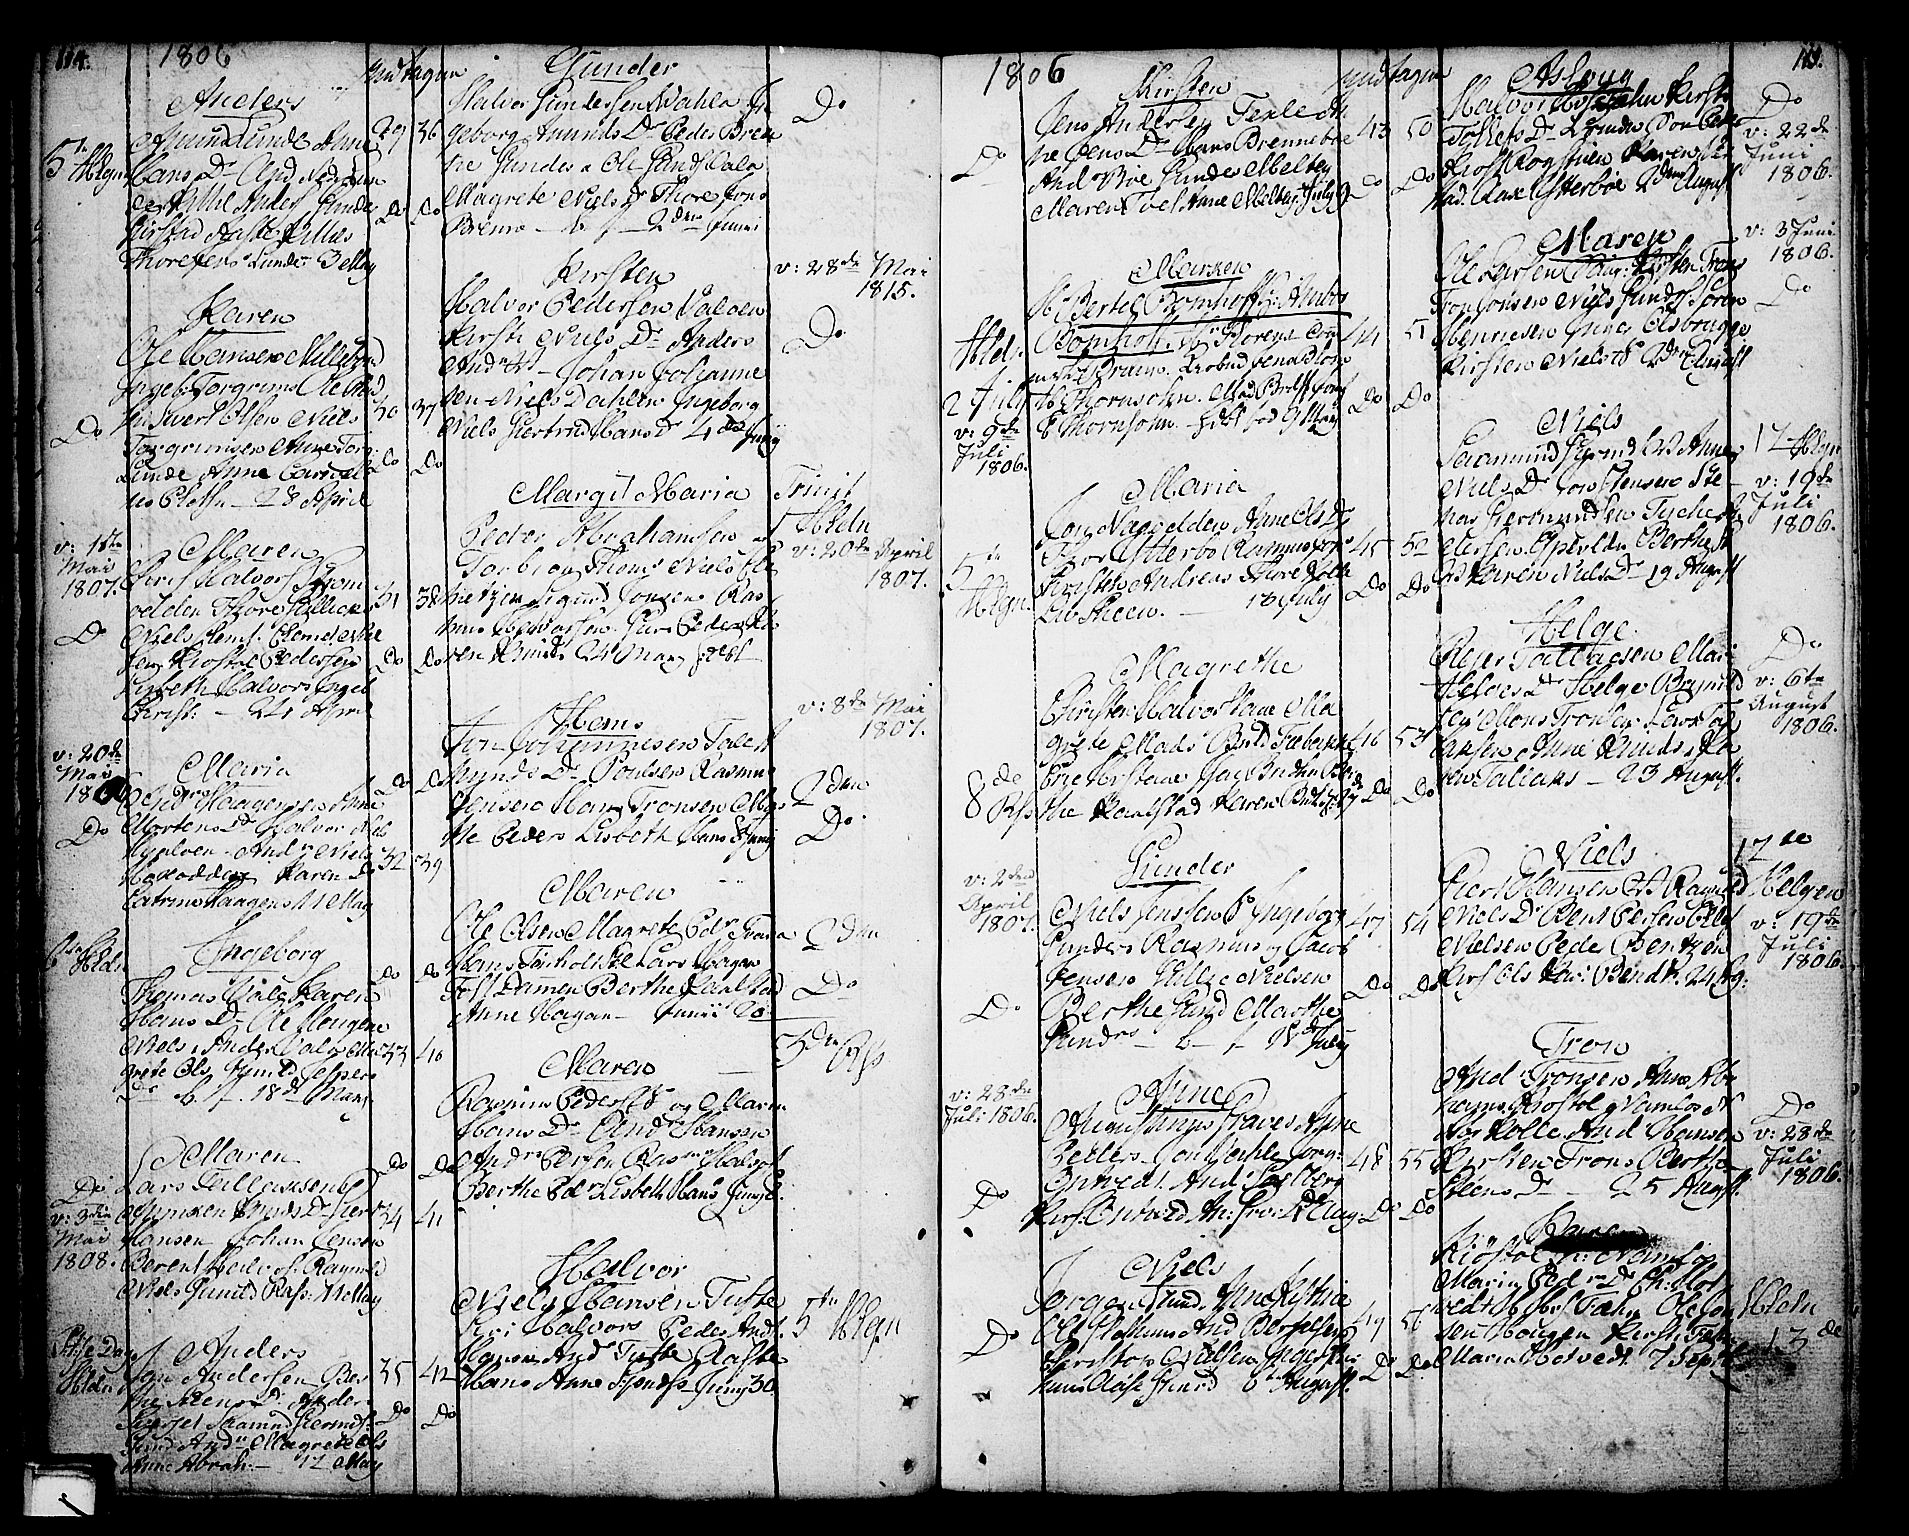 SAKO, Holla kirkebøker, F/Fa/L0002: Ministerialbok nr. 2, 1779-1814, s. 114-115